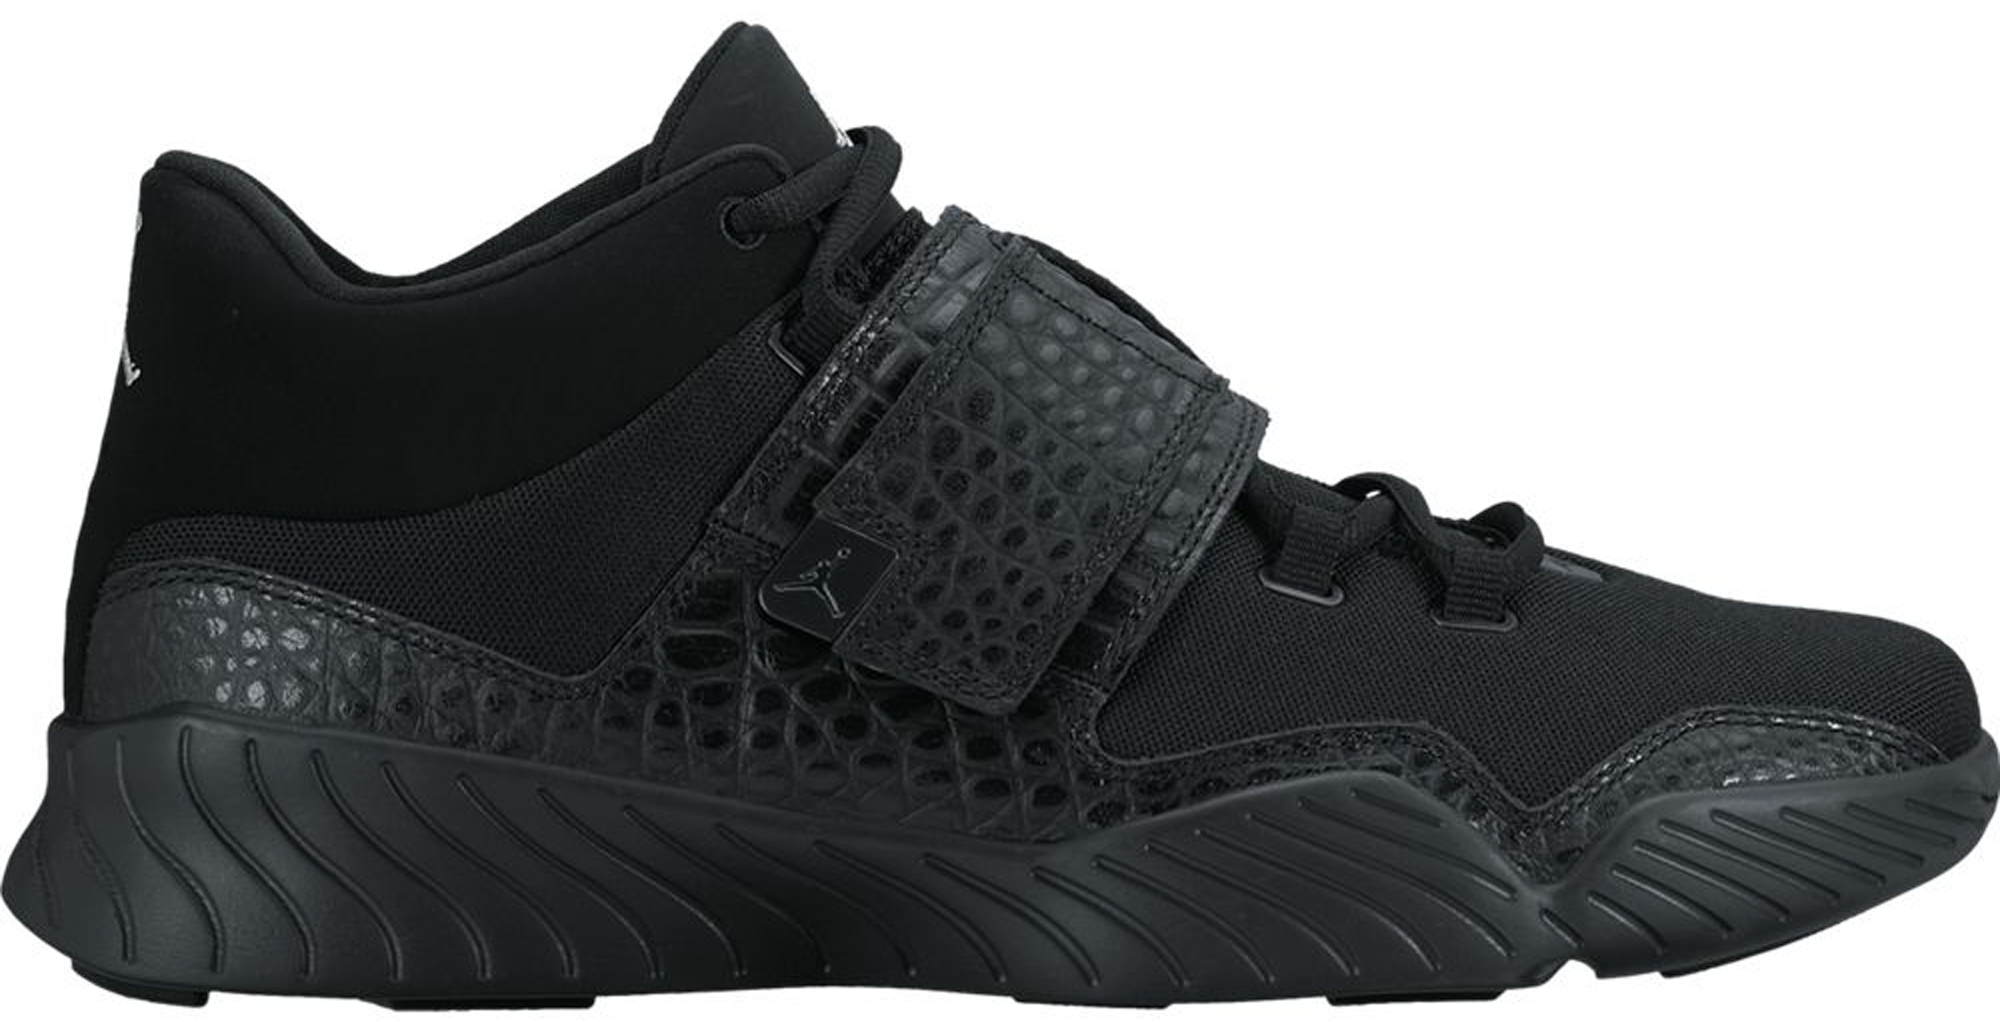 Jordan J23 Triple Black - 854557-001